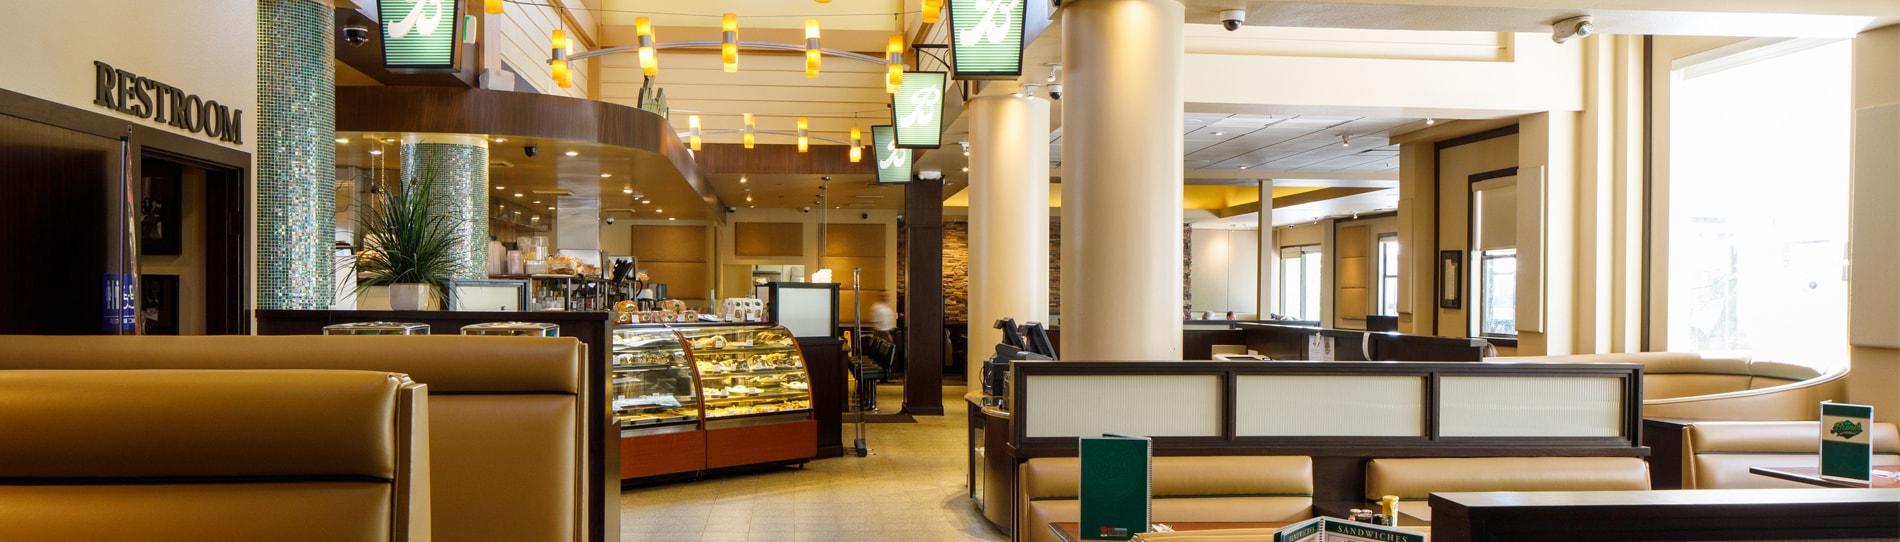 Contact Us | Delicatessen & Restaurant | Brent's Deli